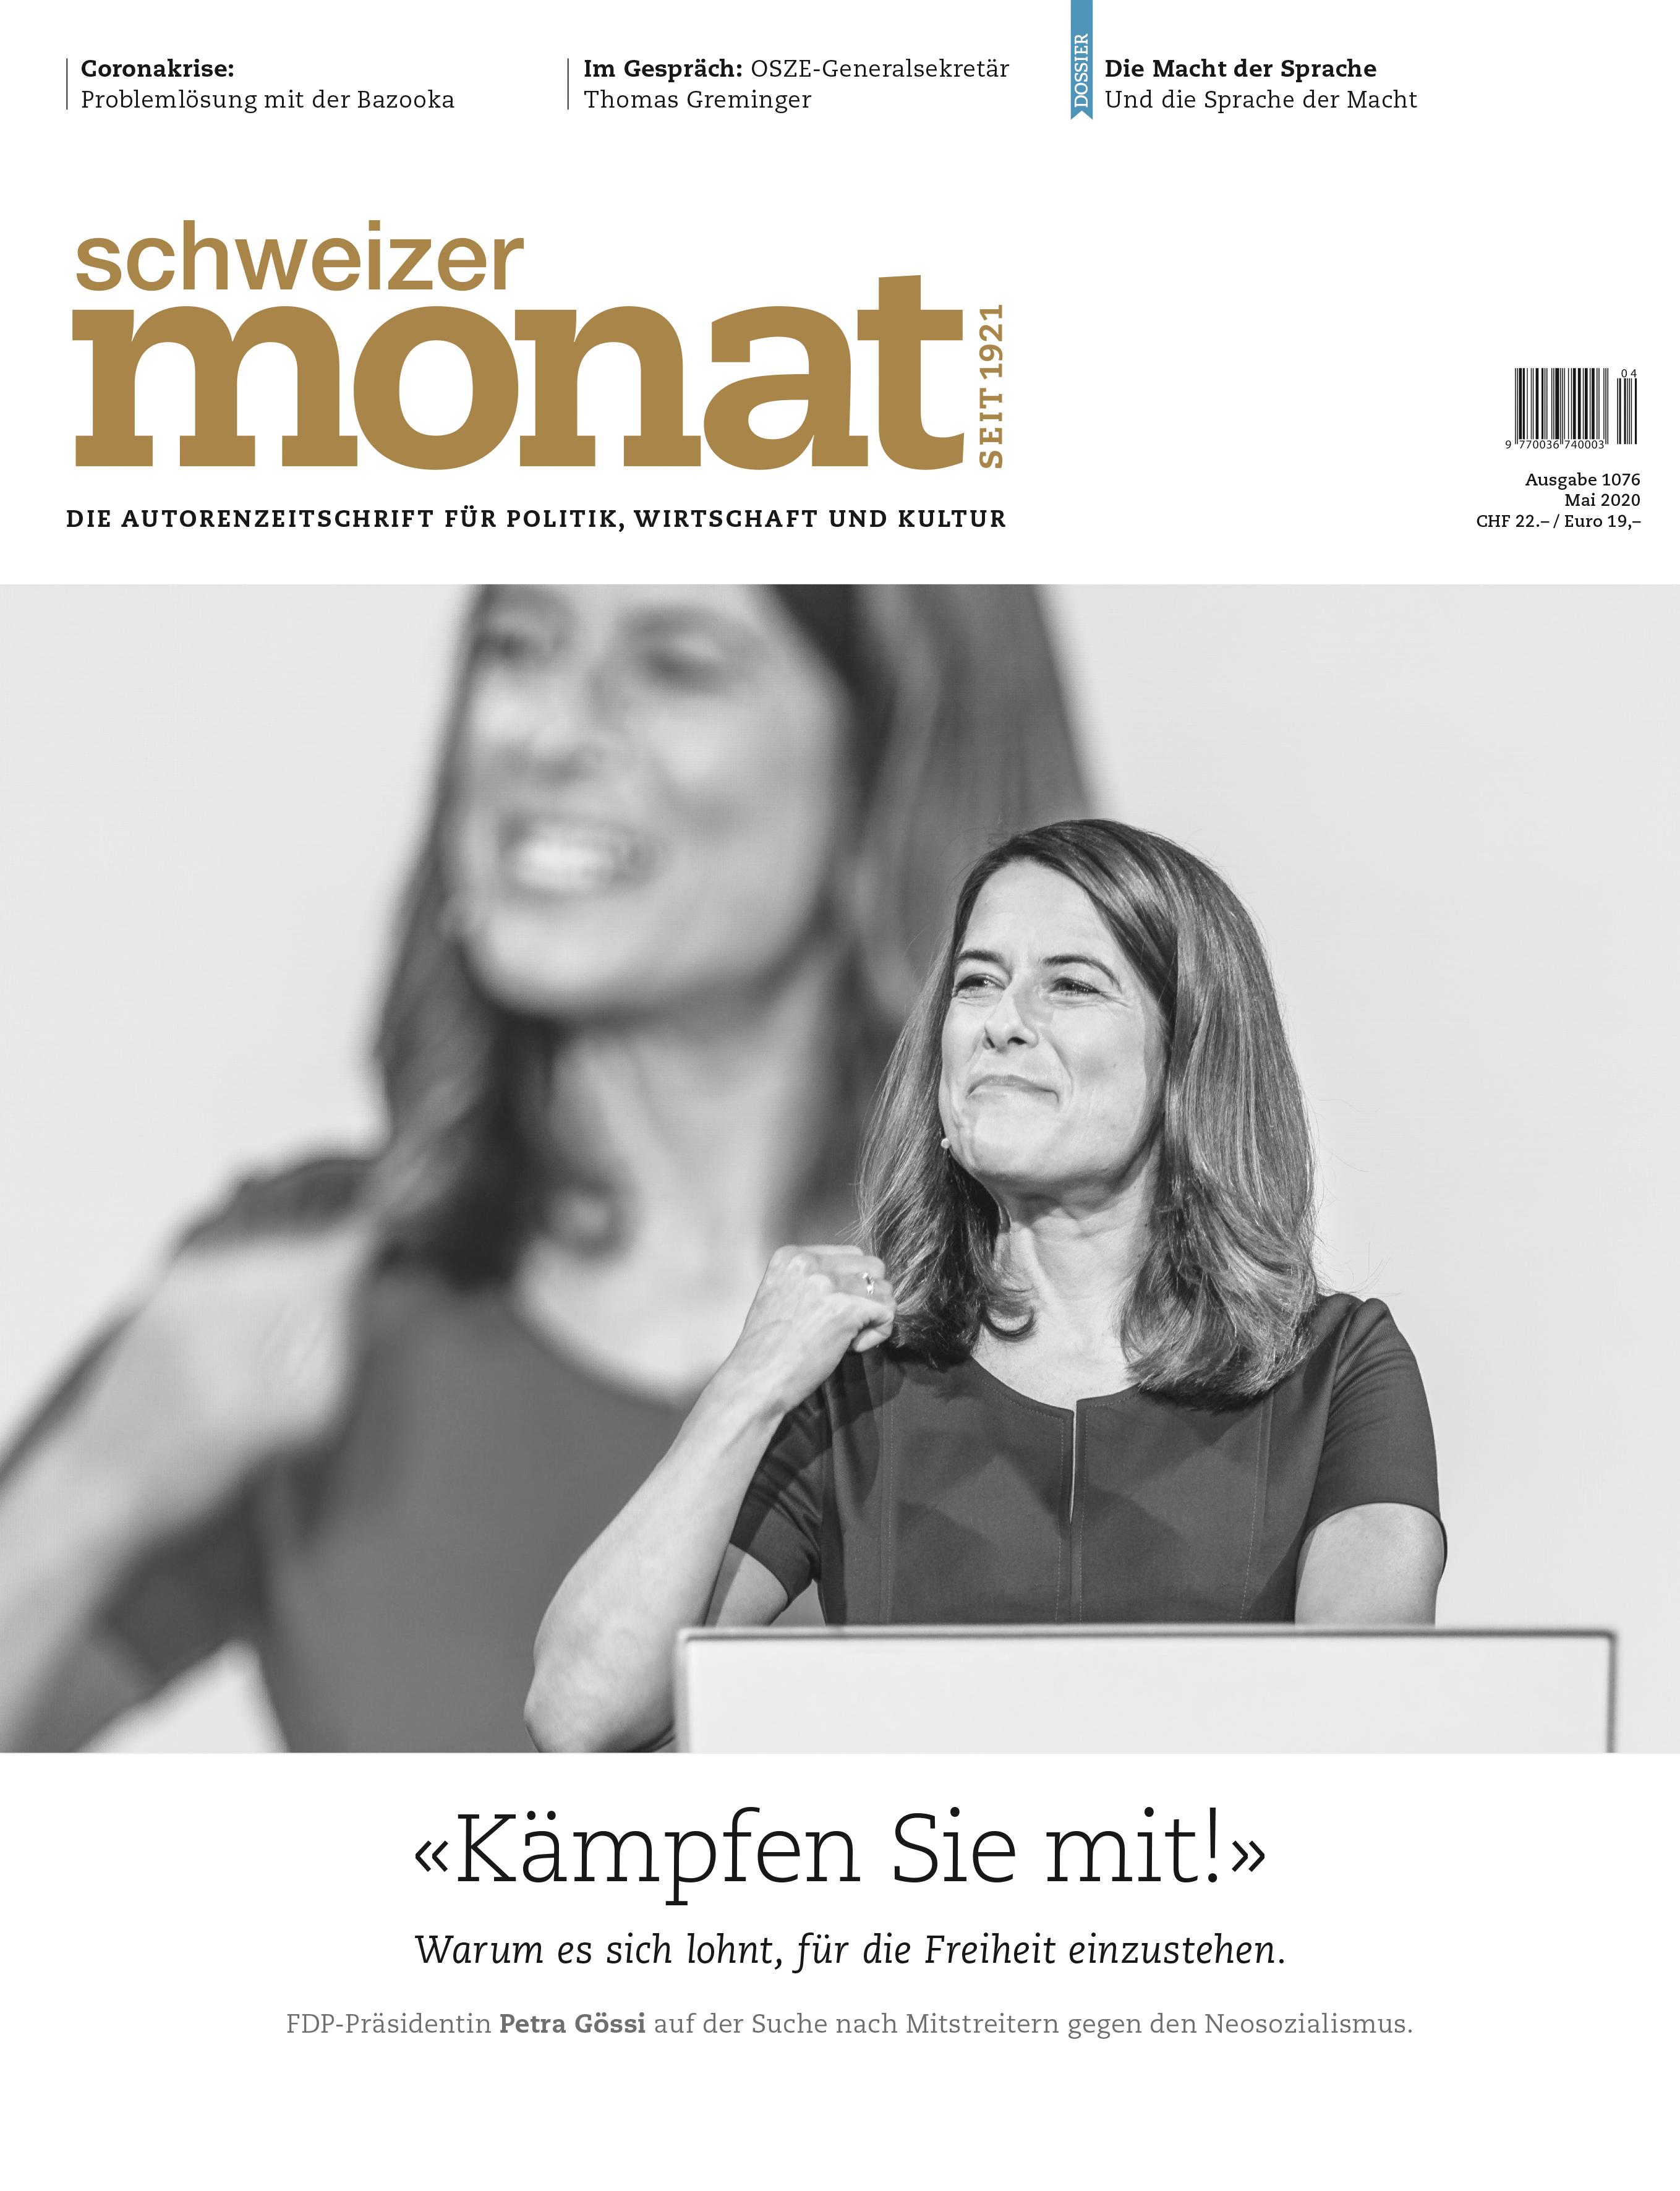 Zum Rücktritt von Petra Gössi